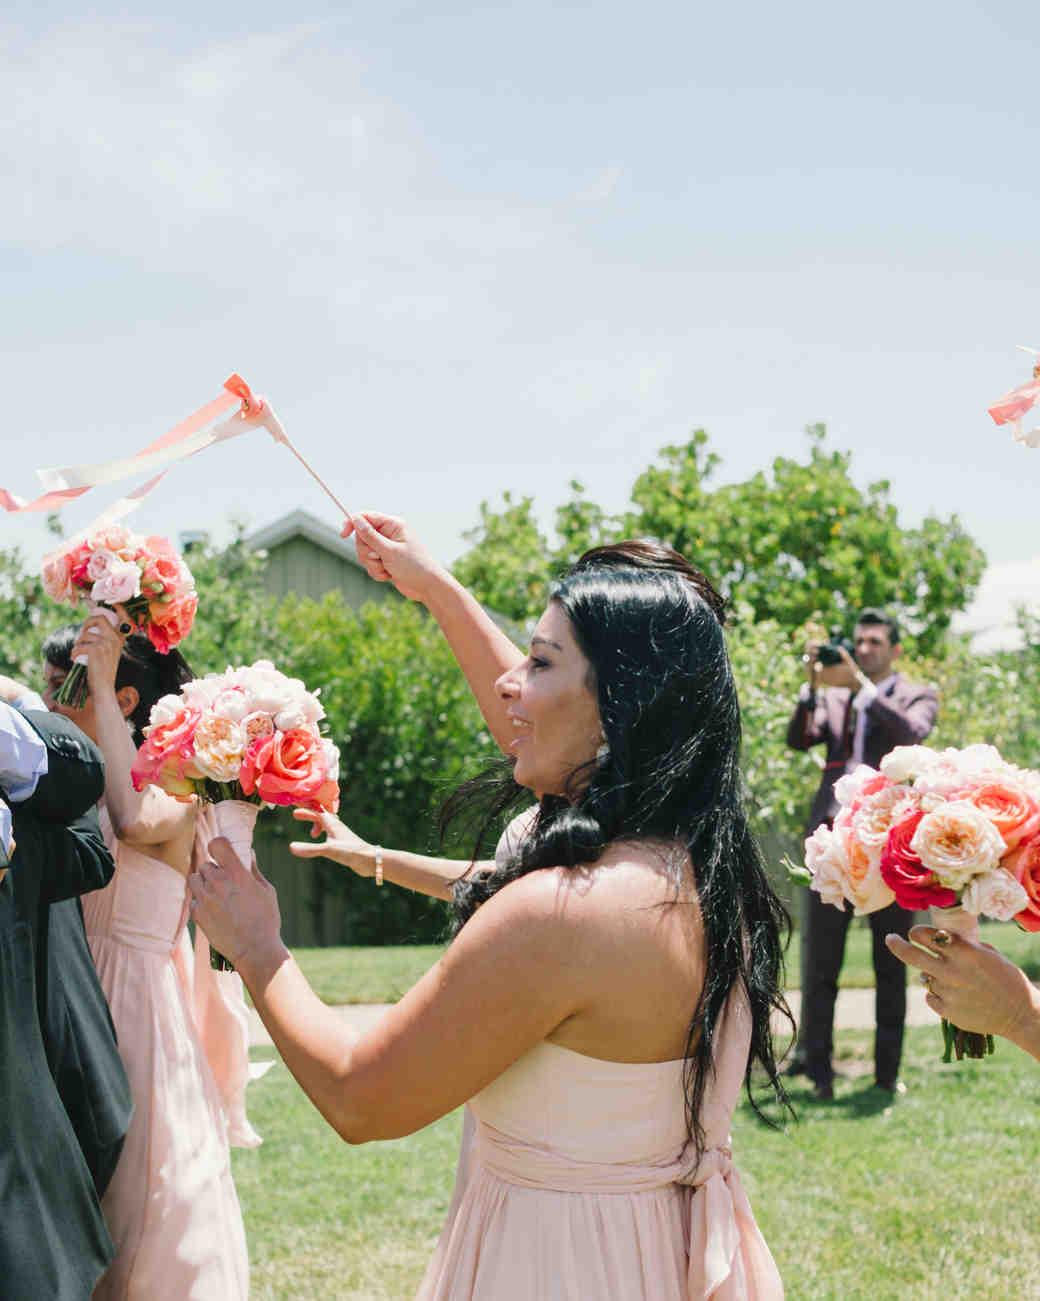 vanessa-joe-wedding-ribbons-11250-s111736-1214.jpg